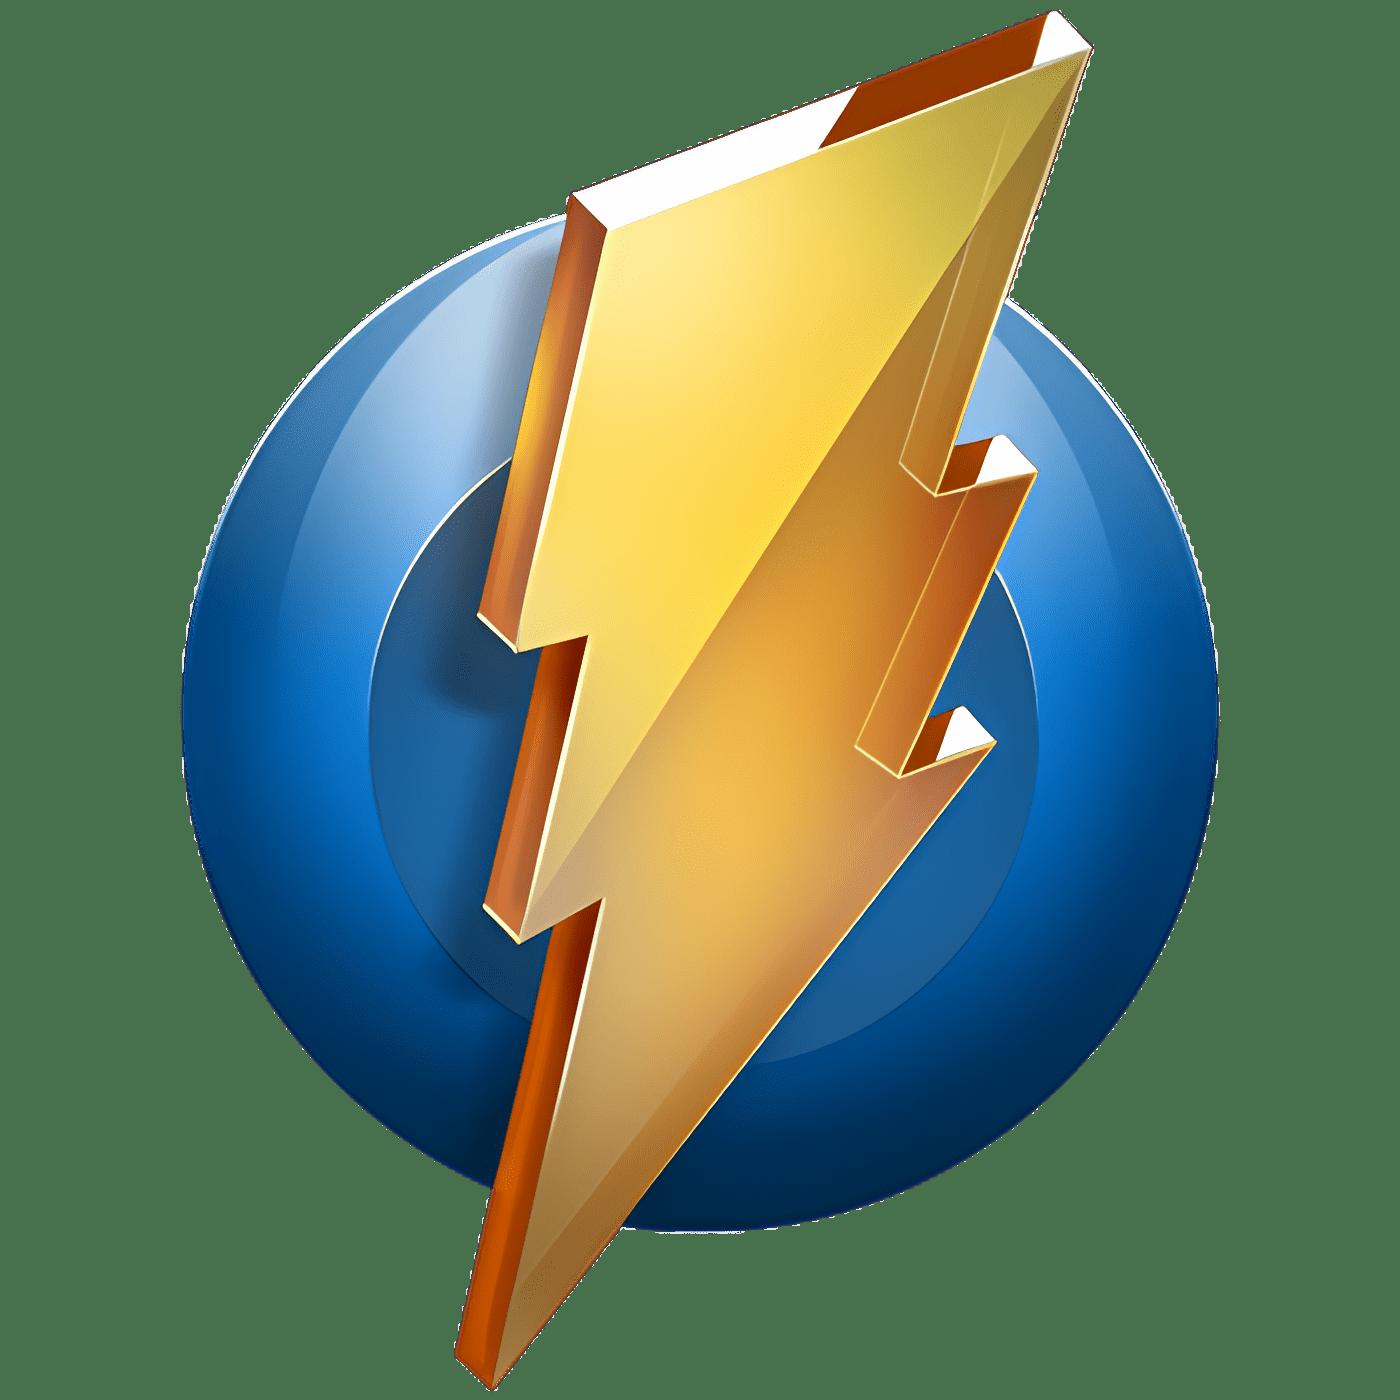 Monosnap 3.3.0